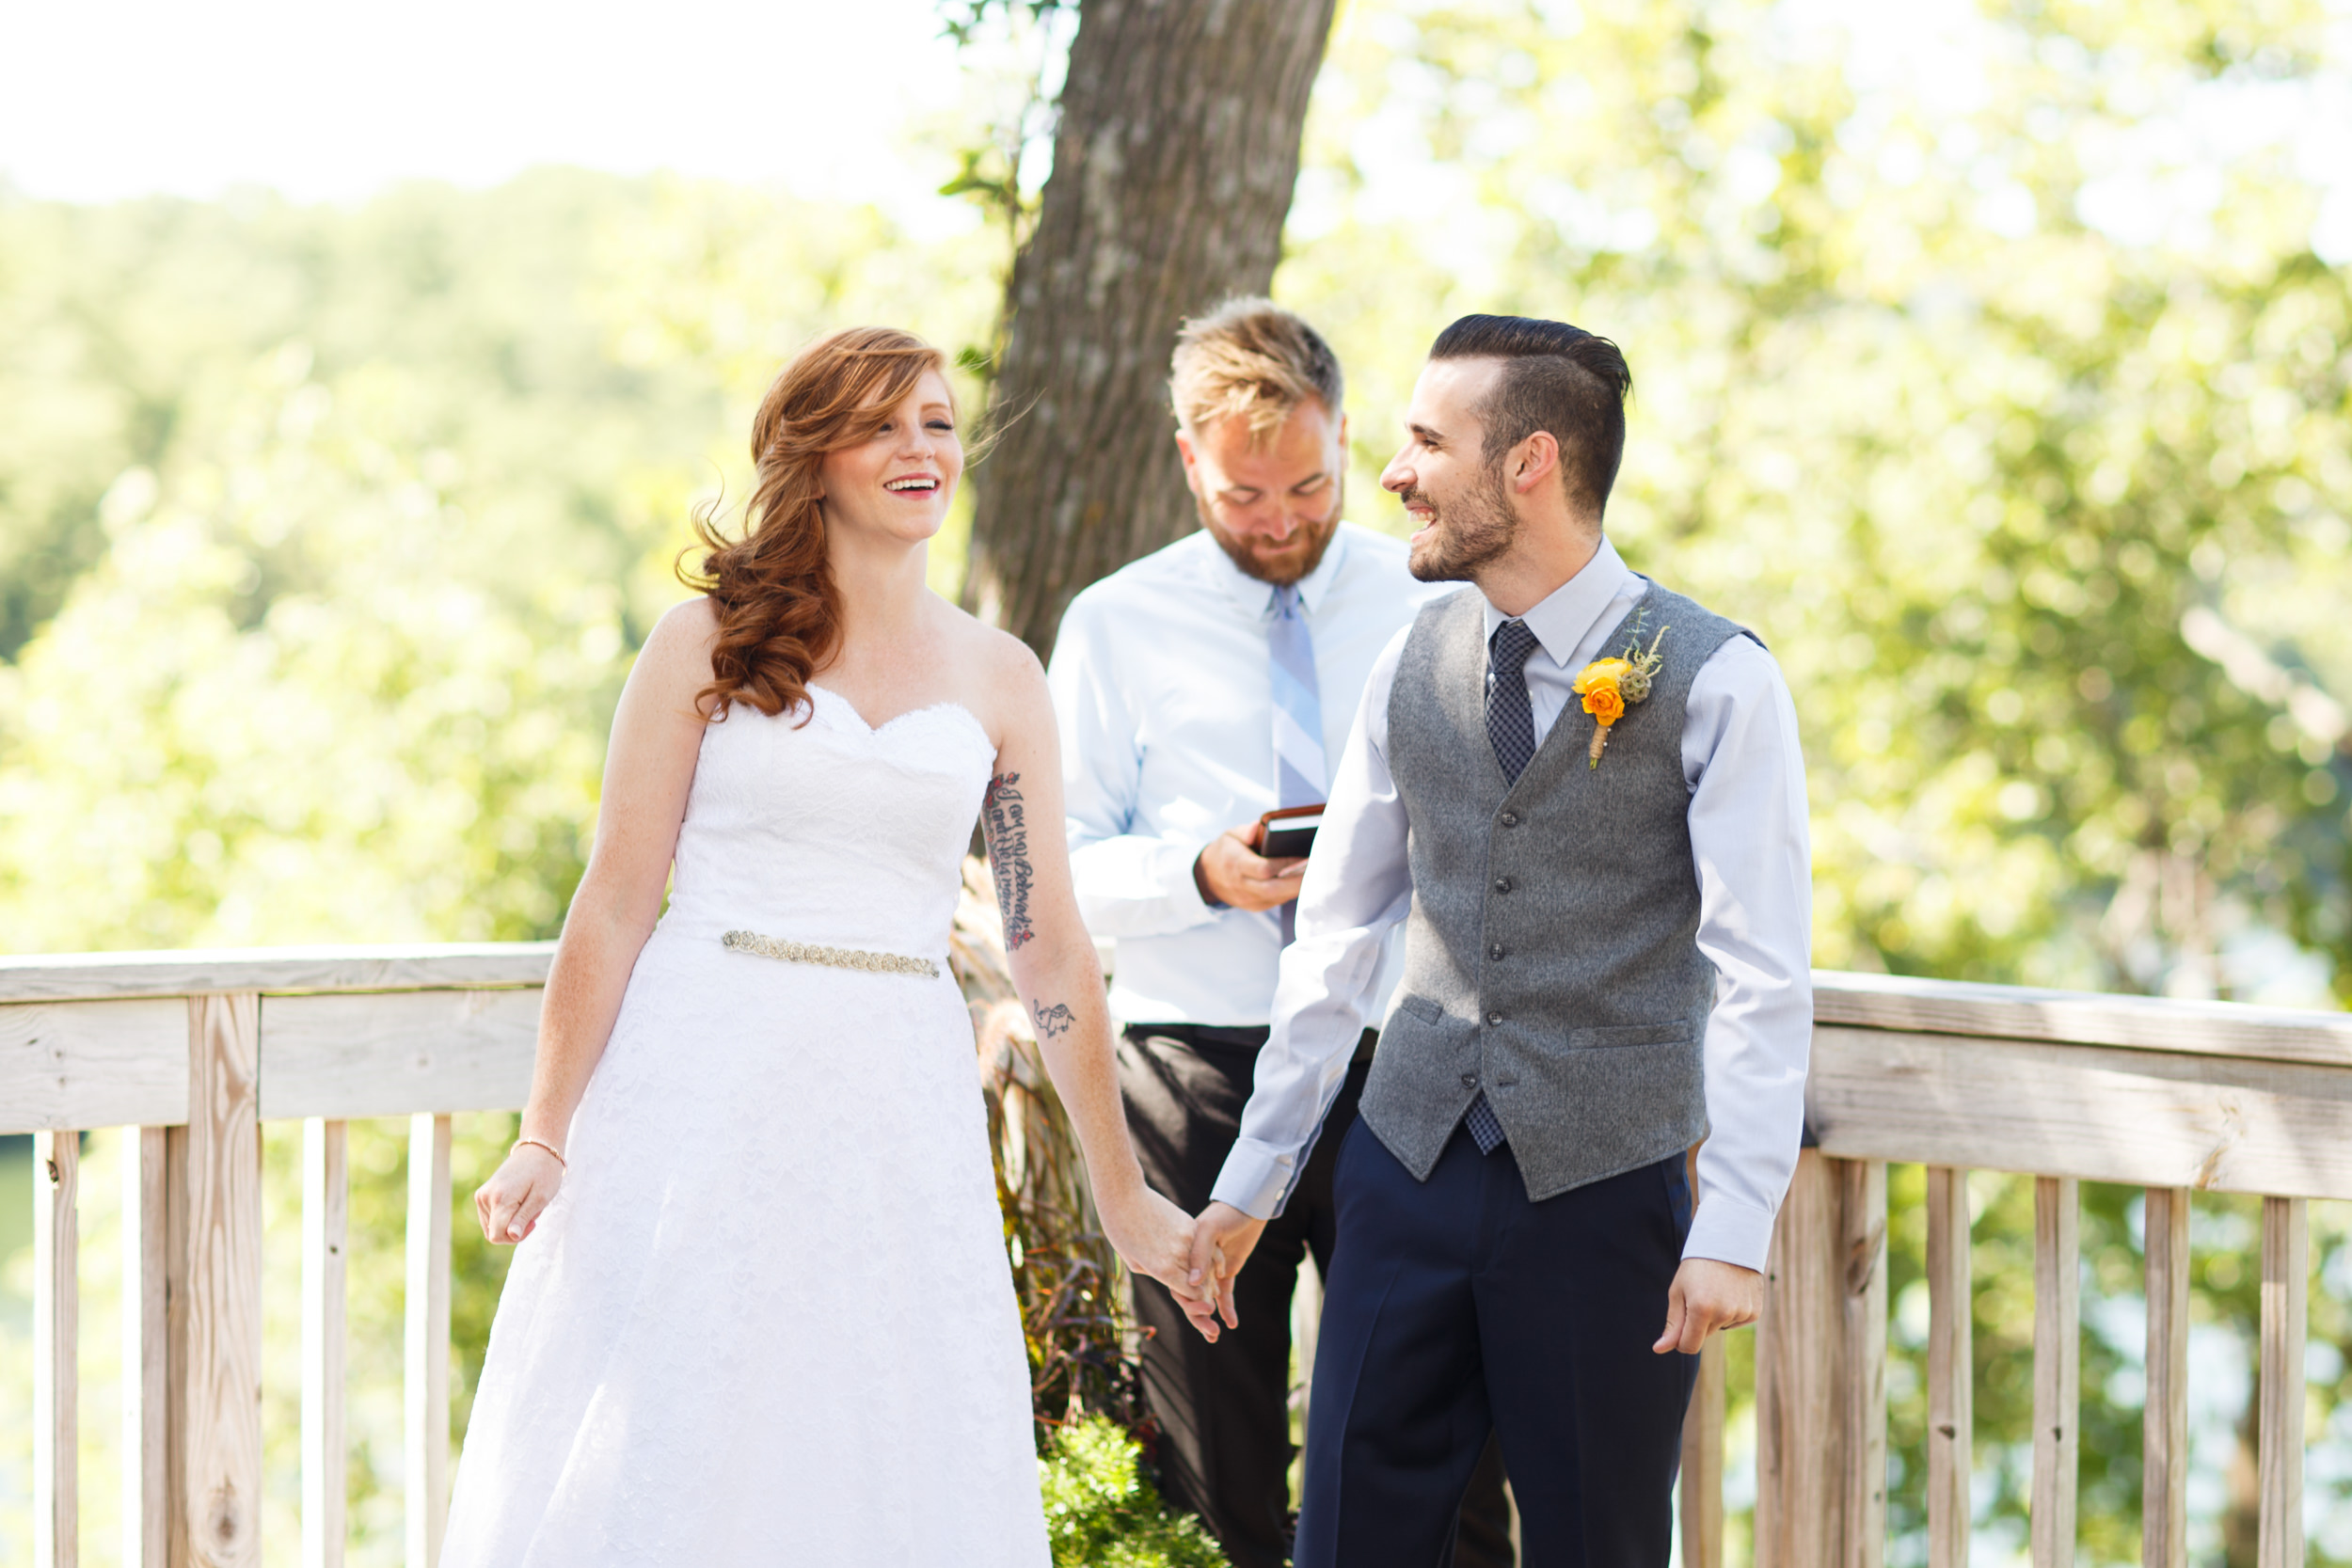 7-25-2015 Sarah and Jimmy's Eagle Ridge Downtown Galena Wedding-155.jpg